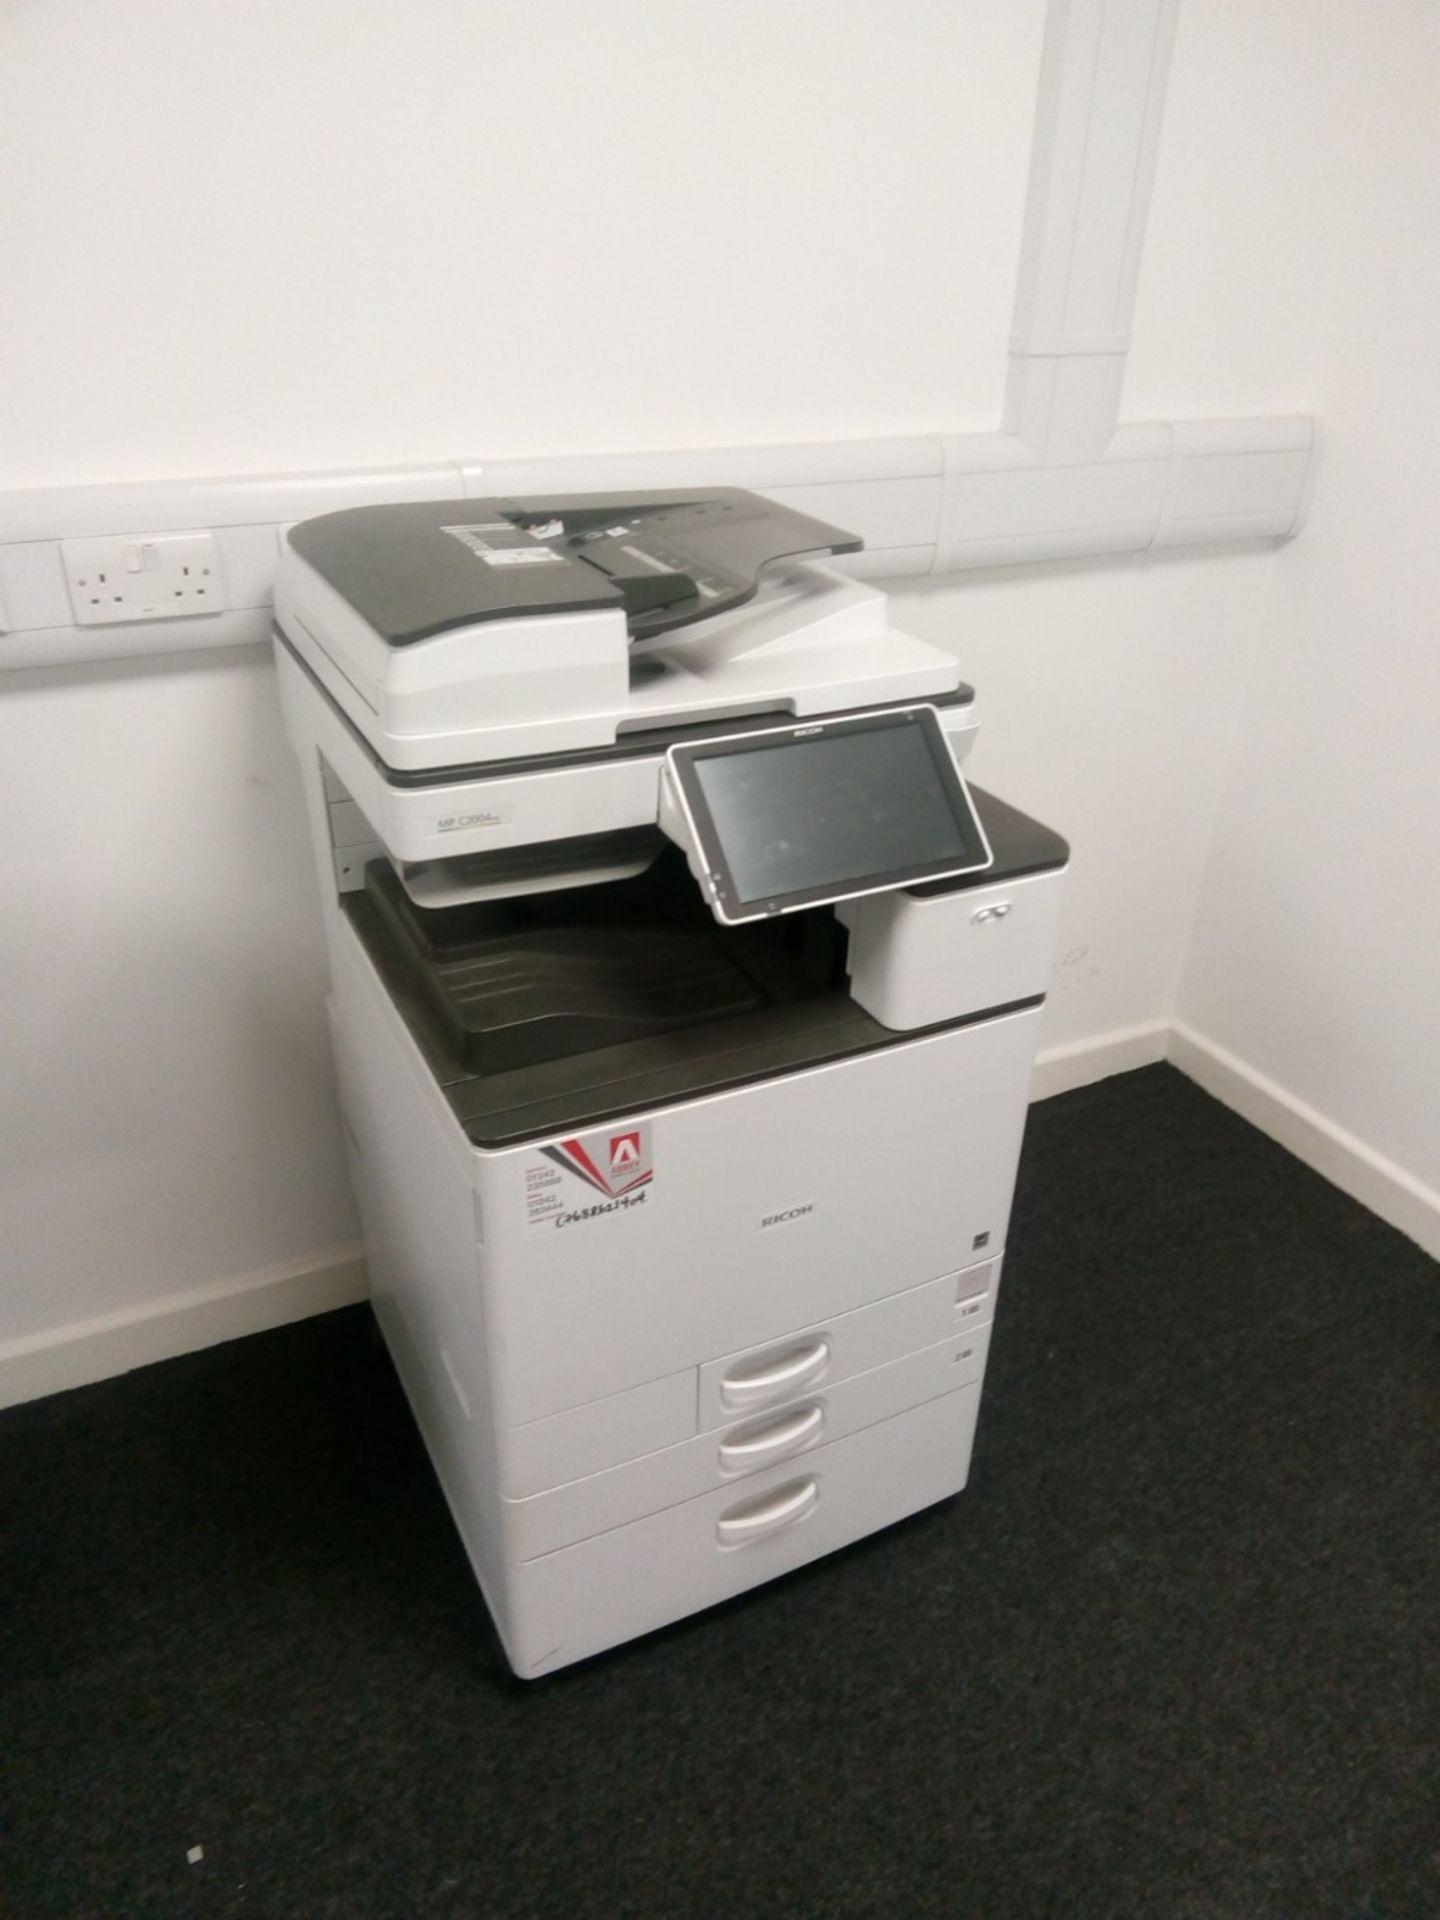 Ricoh MPC2004sp Multifunctional Device, Printer, Photocopier